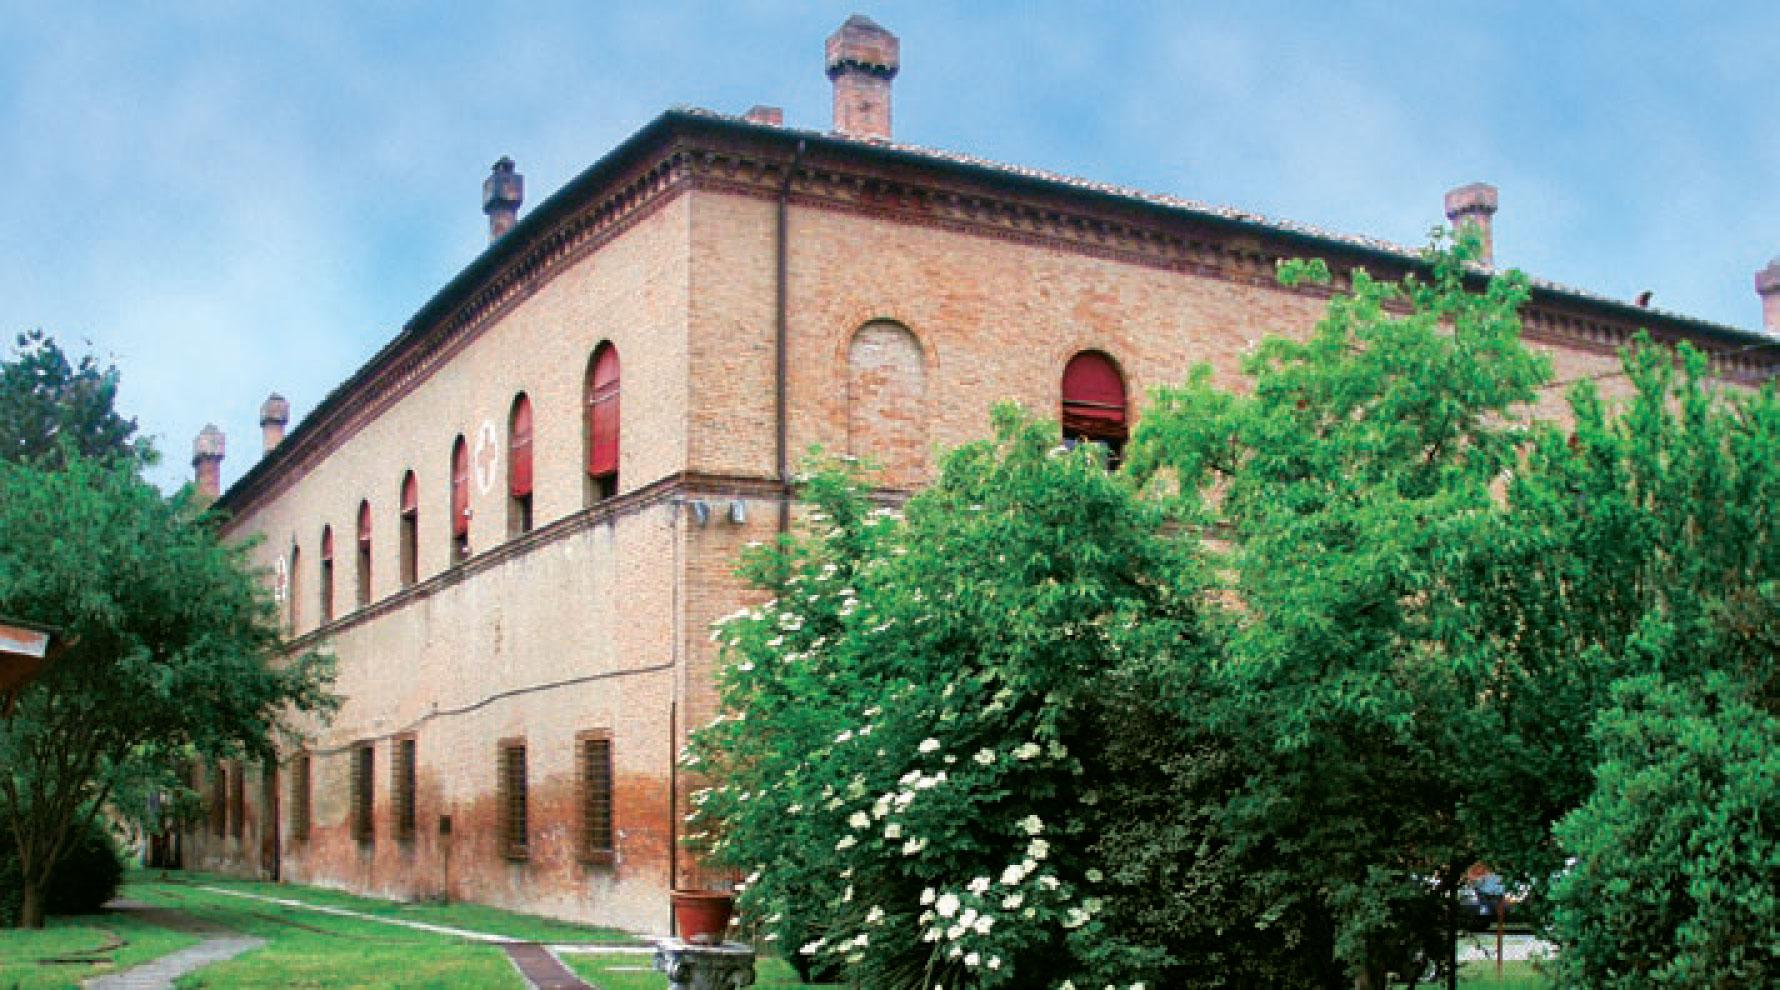 Ramazzini institute front view